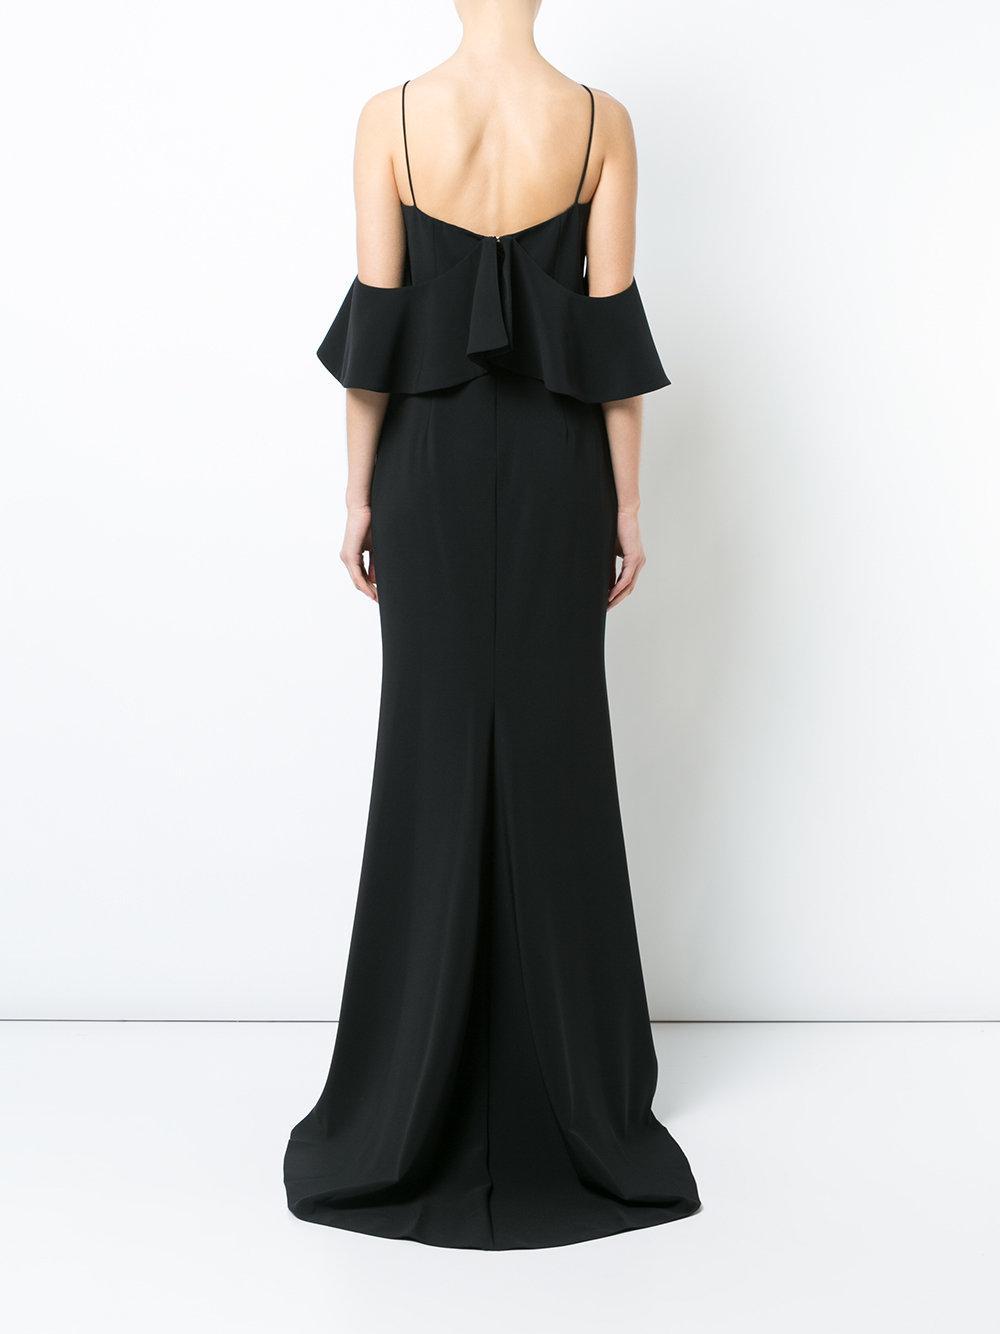 cold shoulder gown - Black Christian Siriano okFfKm